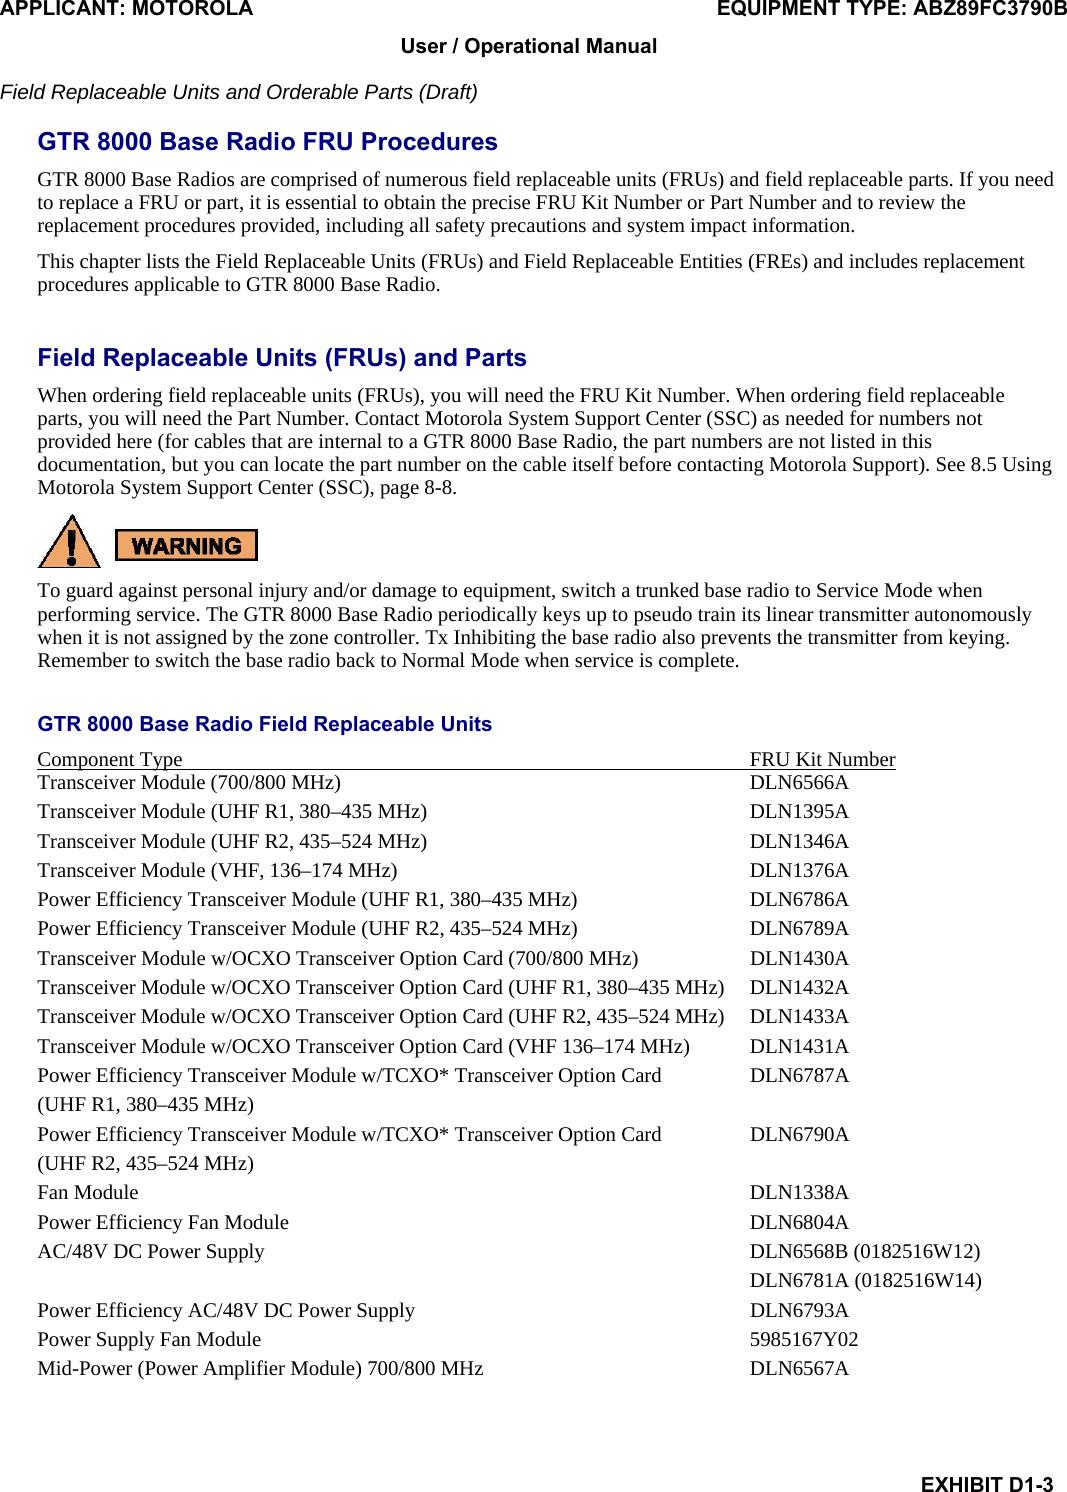 Motorola Solutions 89FC3790B Non Broadcast Transmitter User